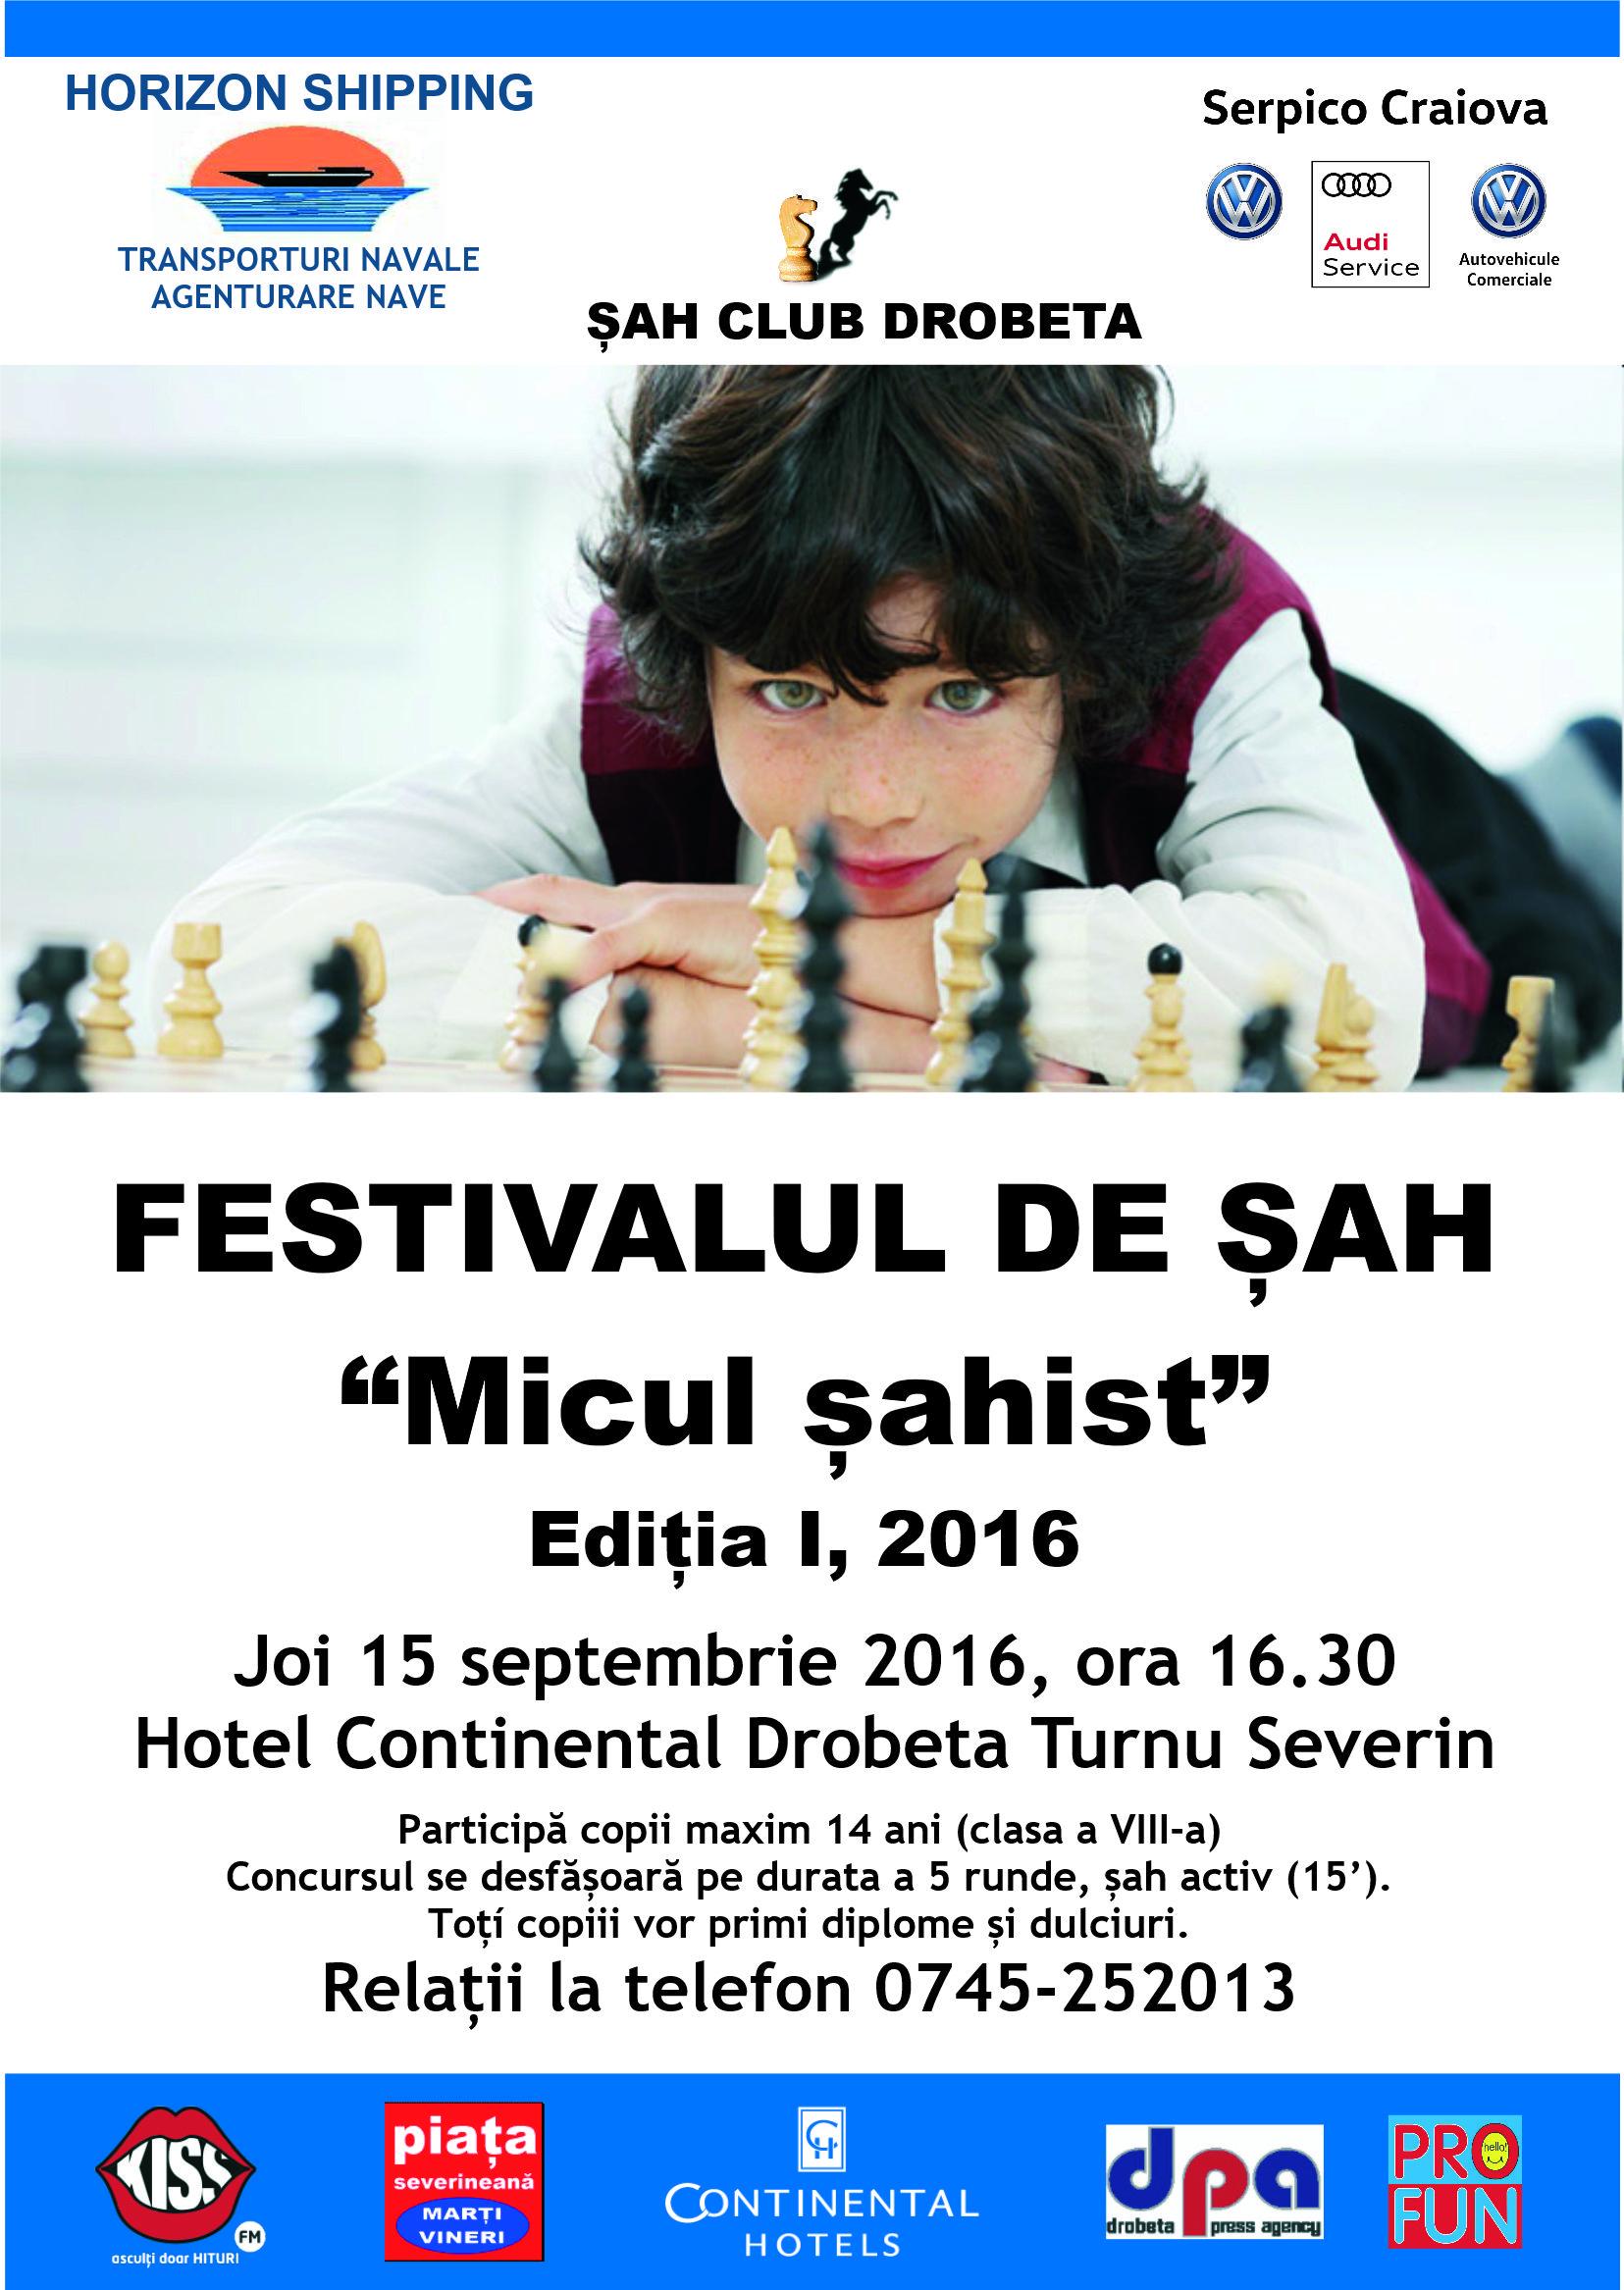 "Festivalul șahist ""Micul șahist"", joi15 septembrie 2016, ora 16.30, Hotel Continental Drobeta Turnu Severin"